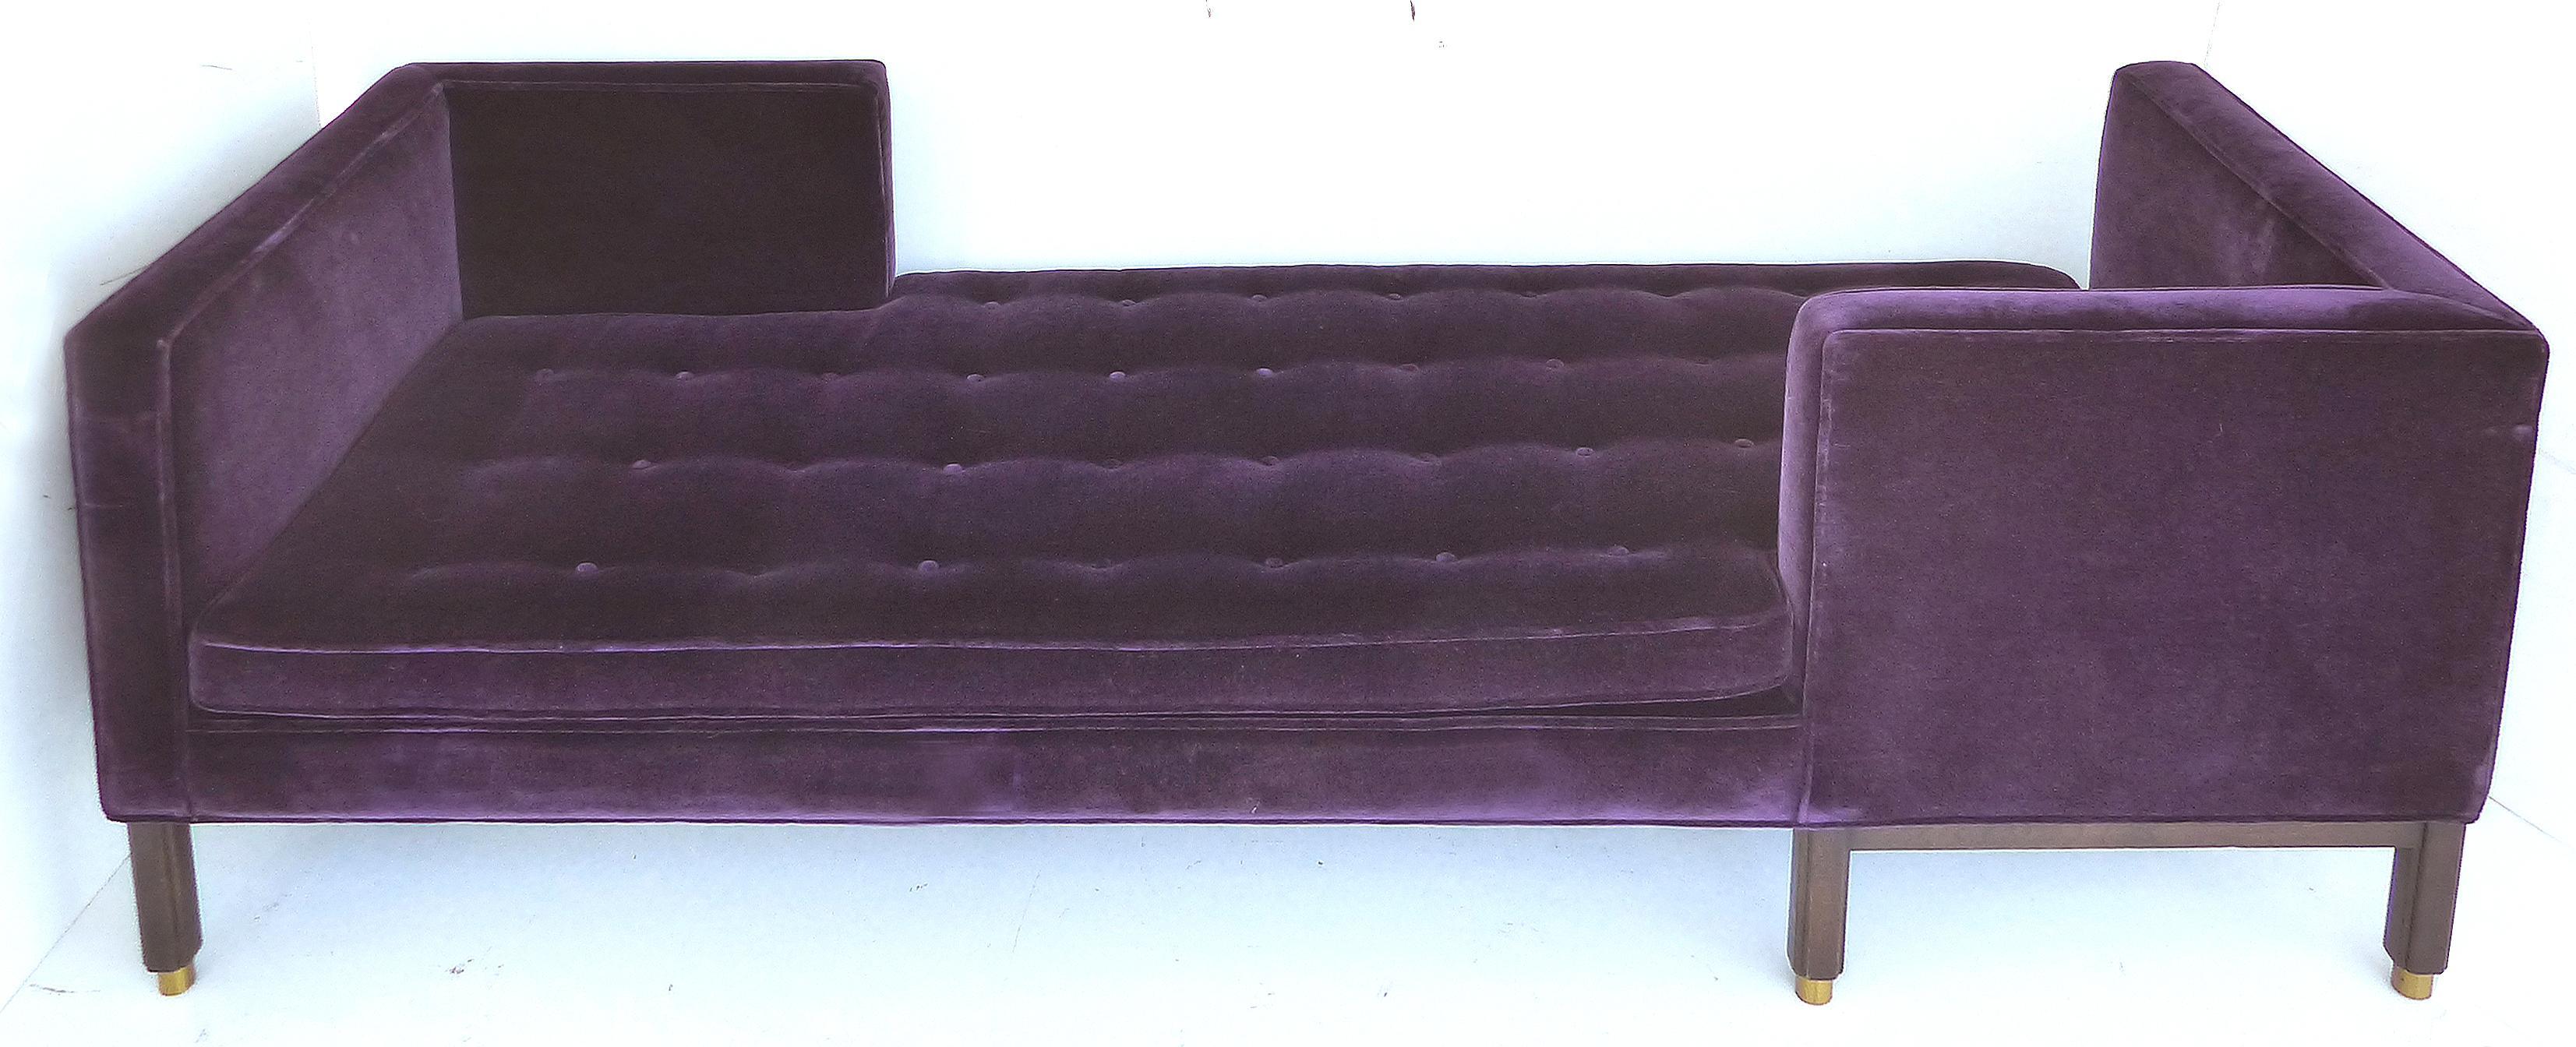 Edward Wormley Tête à Tête Sofa (Model 5944) For Dunbar, C